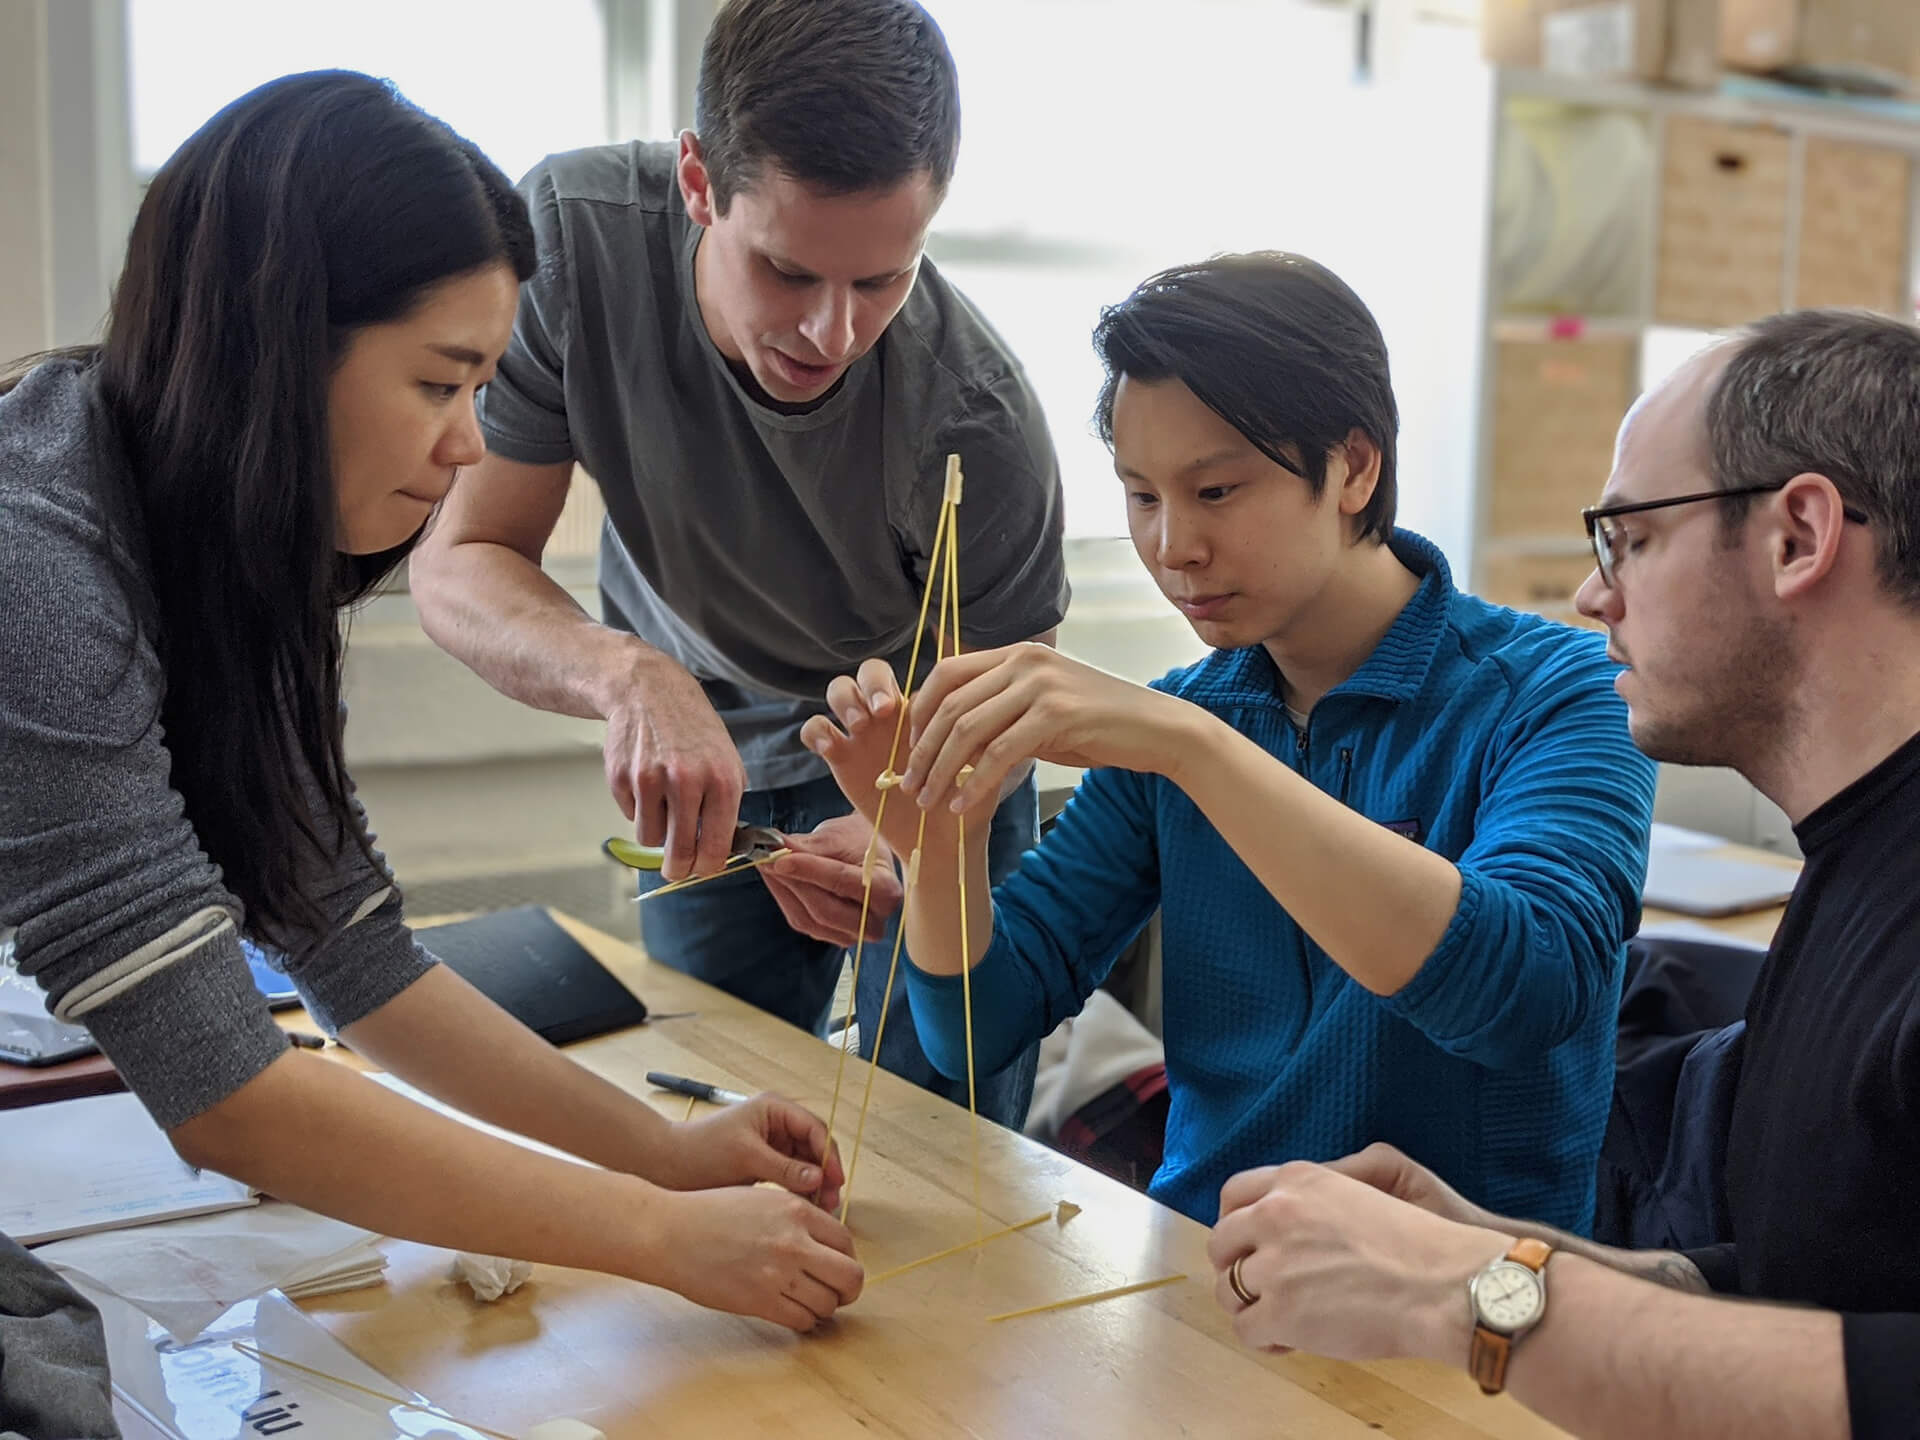 Allay team members building a spaghetti tower